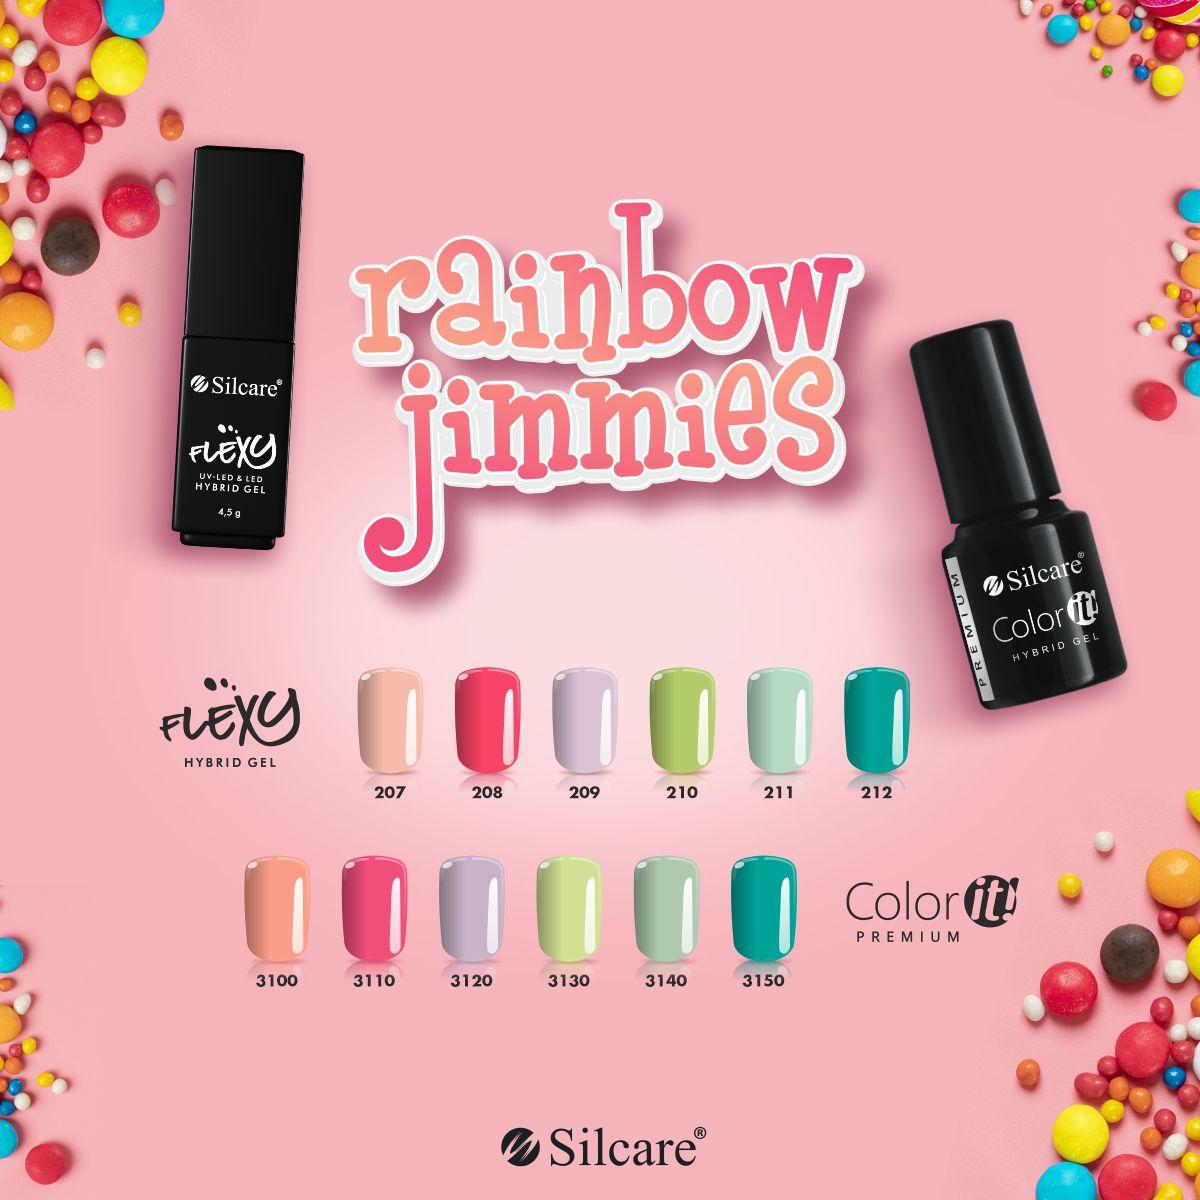 Color IT Premium Lakier Hybrydowy - Kolekcja Rainbow Jimmies 6 g